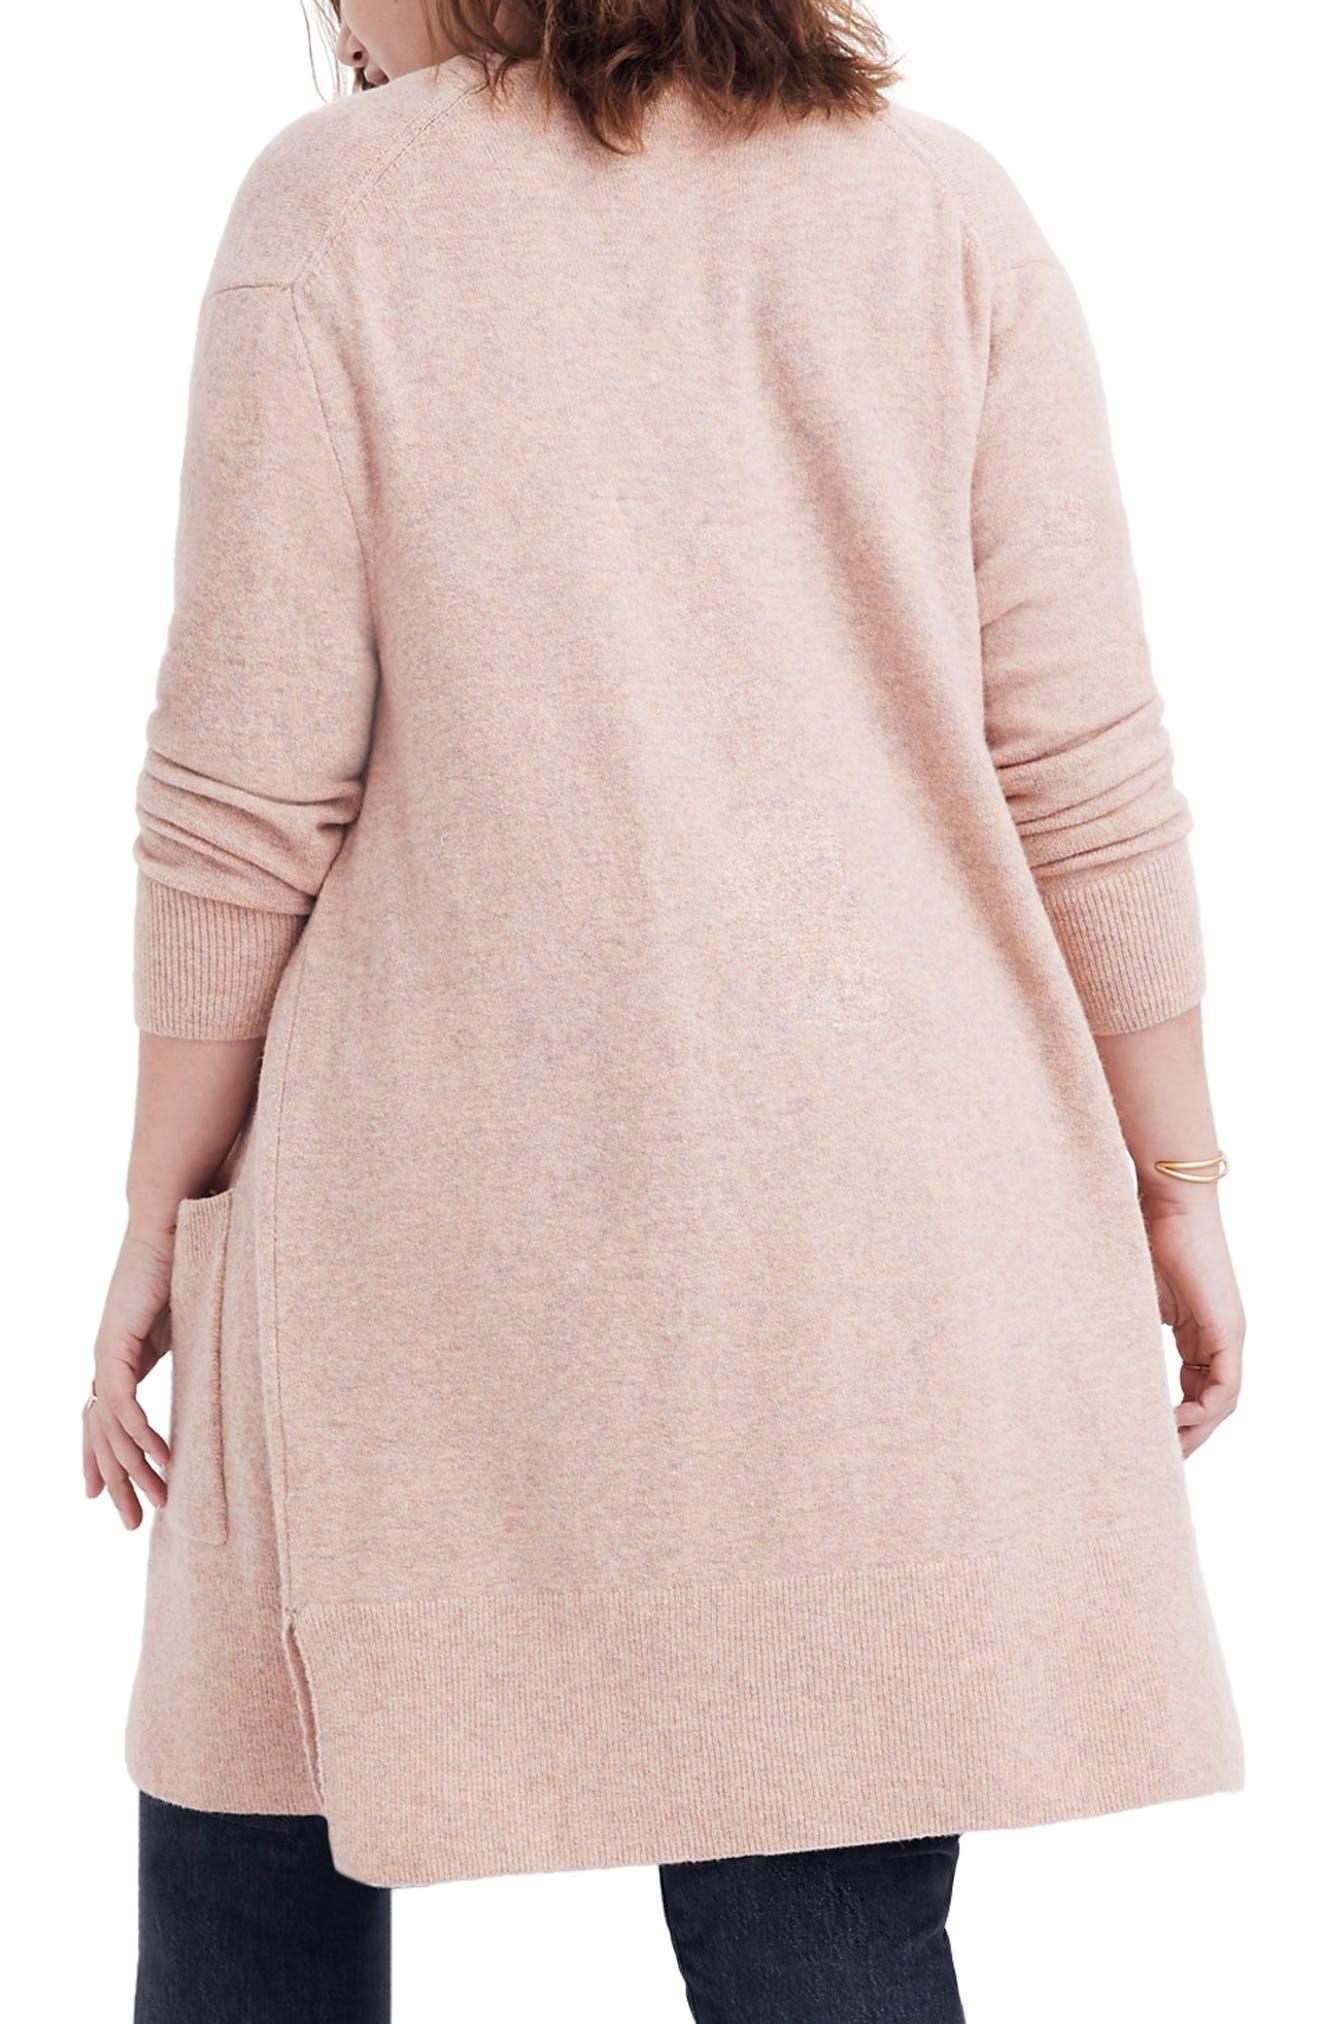 Kent Cardigan Sweater,                             Alternate thumbnail 6, color,                             HEATHER CARNATION